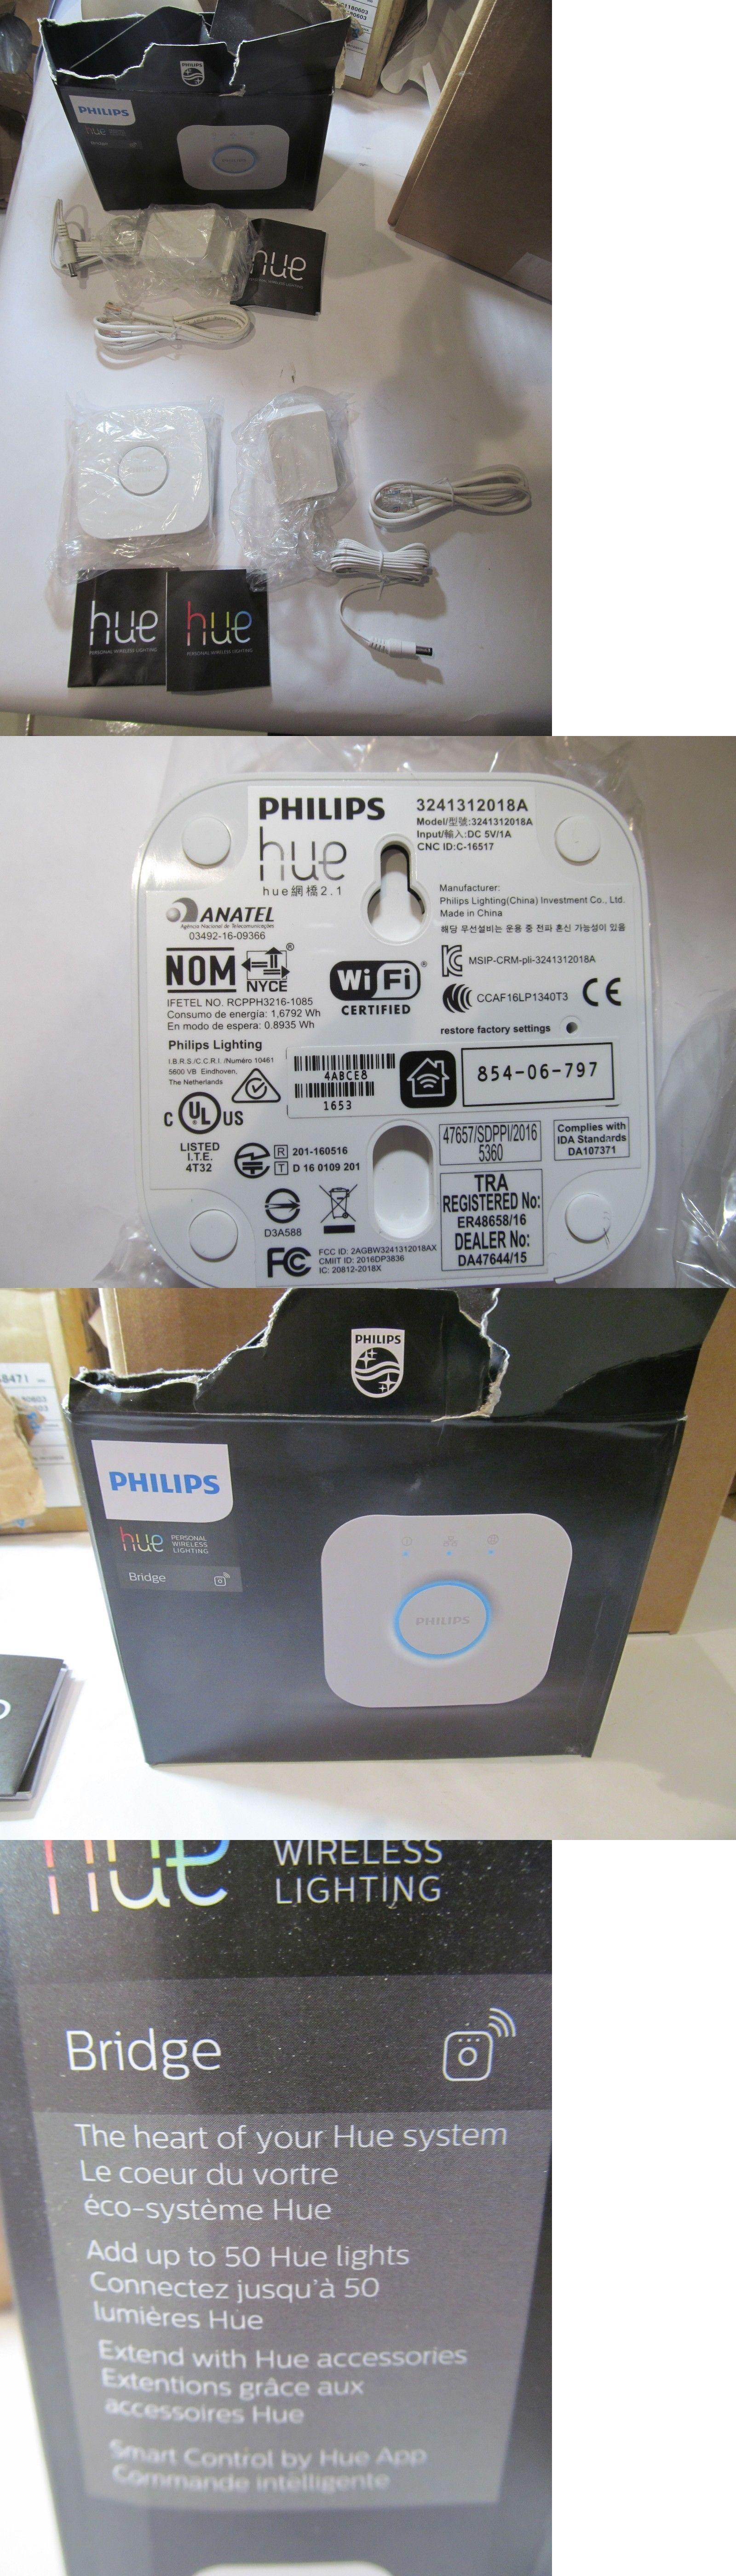 6151a56c8379fe0f052bd3836eeaa2d4 Spannende Philips Hue Wireless Bridge Dekorationen